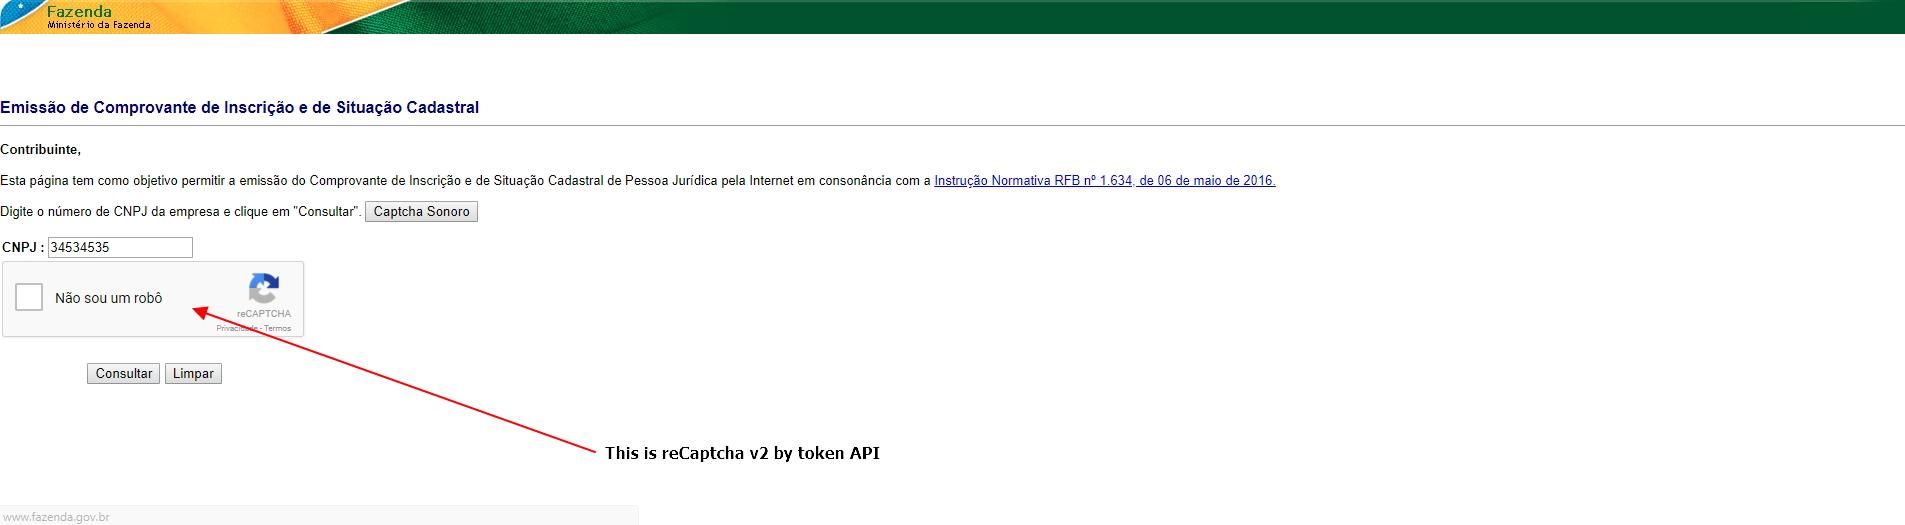 Bypass catcha: intentifying reCaptcha v2 by token API